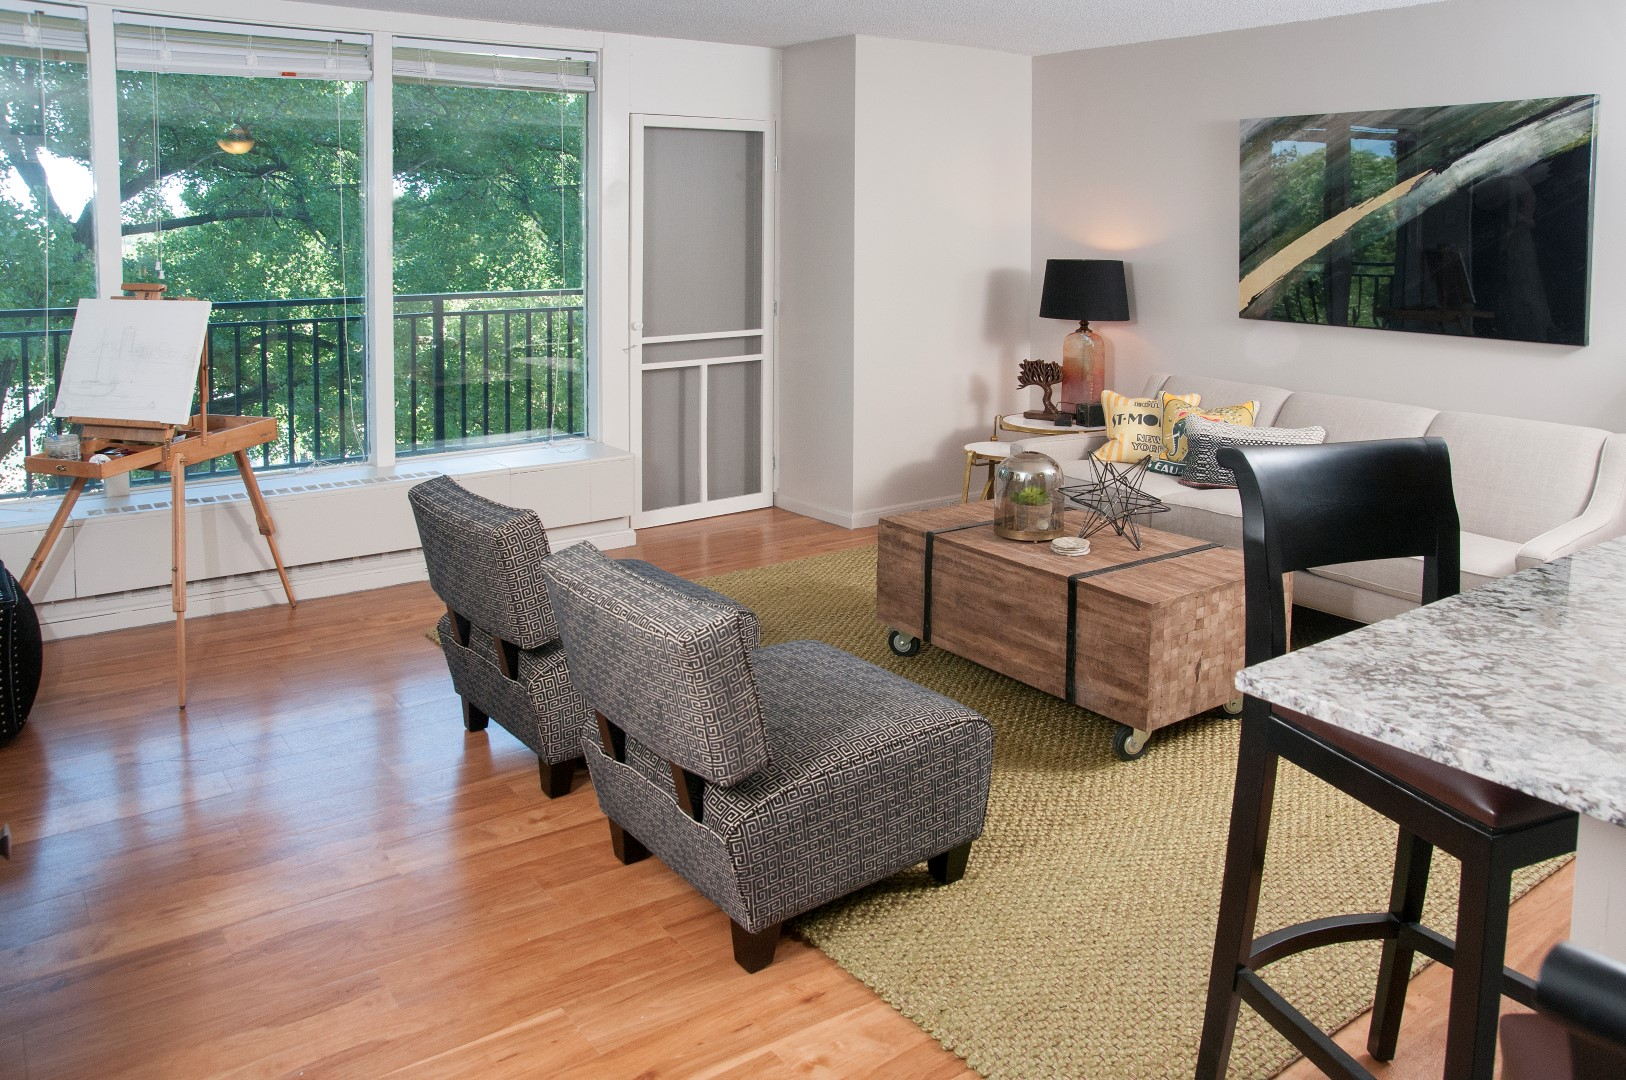 CalhounTowers_Minneapolis_MN_Livingroom_2.jpg